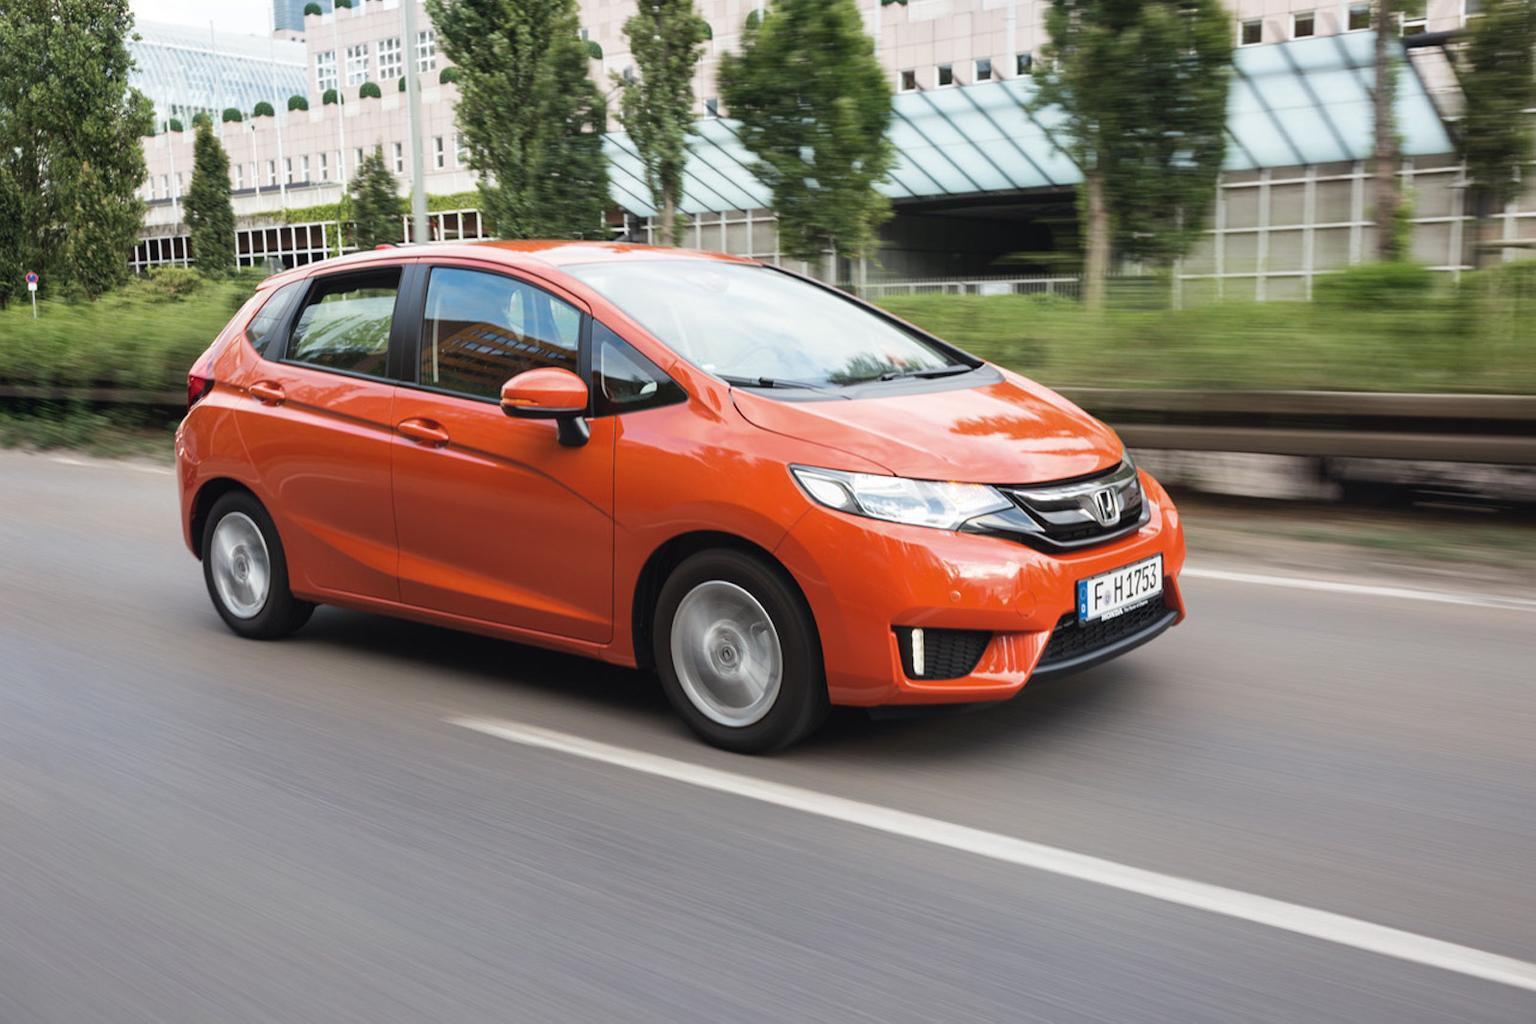 2015 Honda Jazz 1.3 i-VTEC review